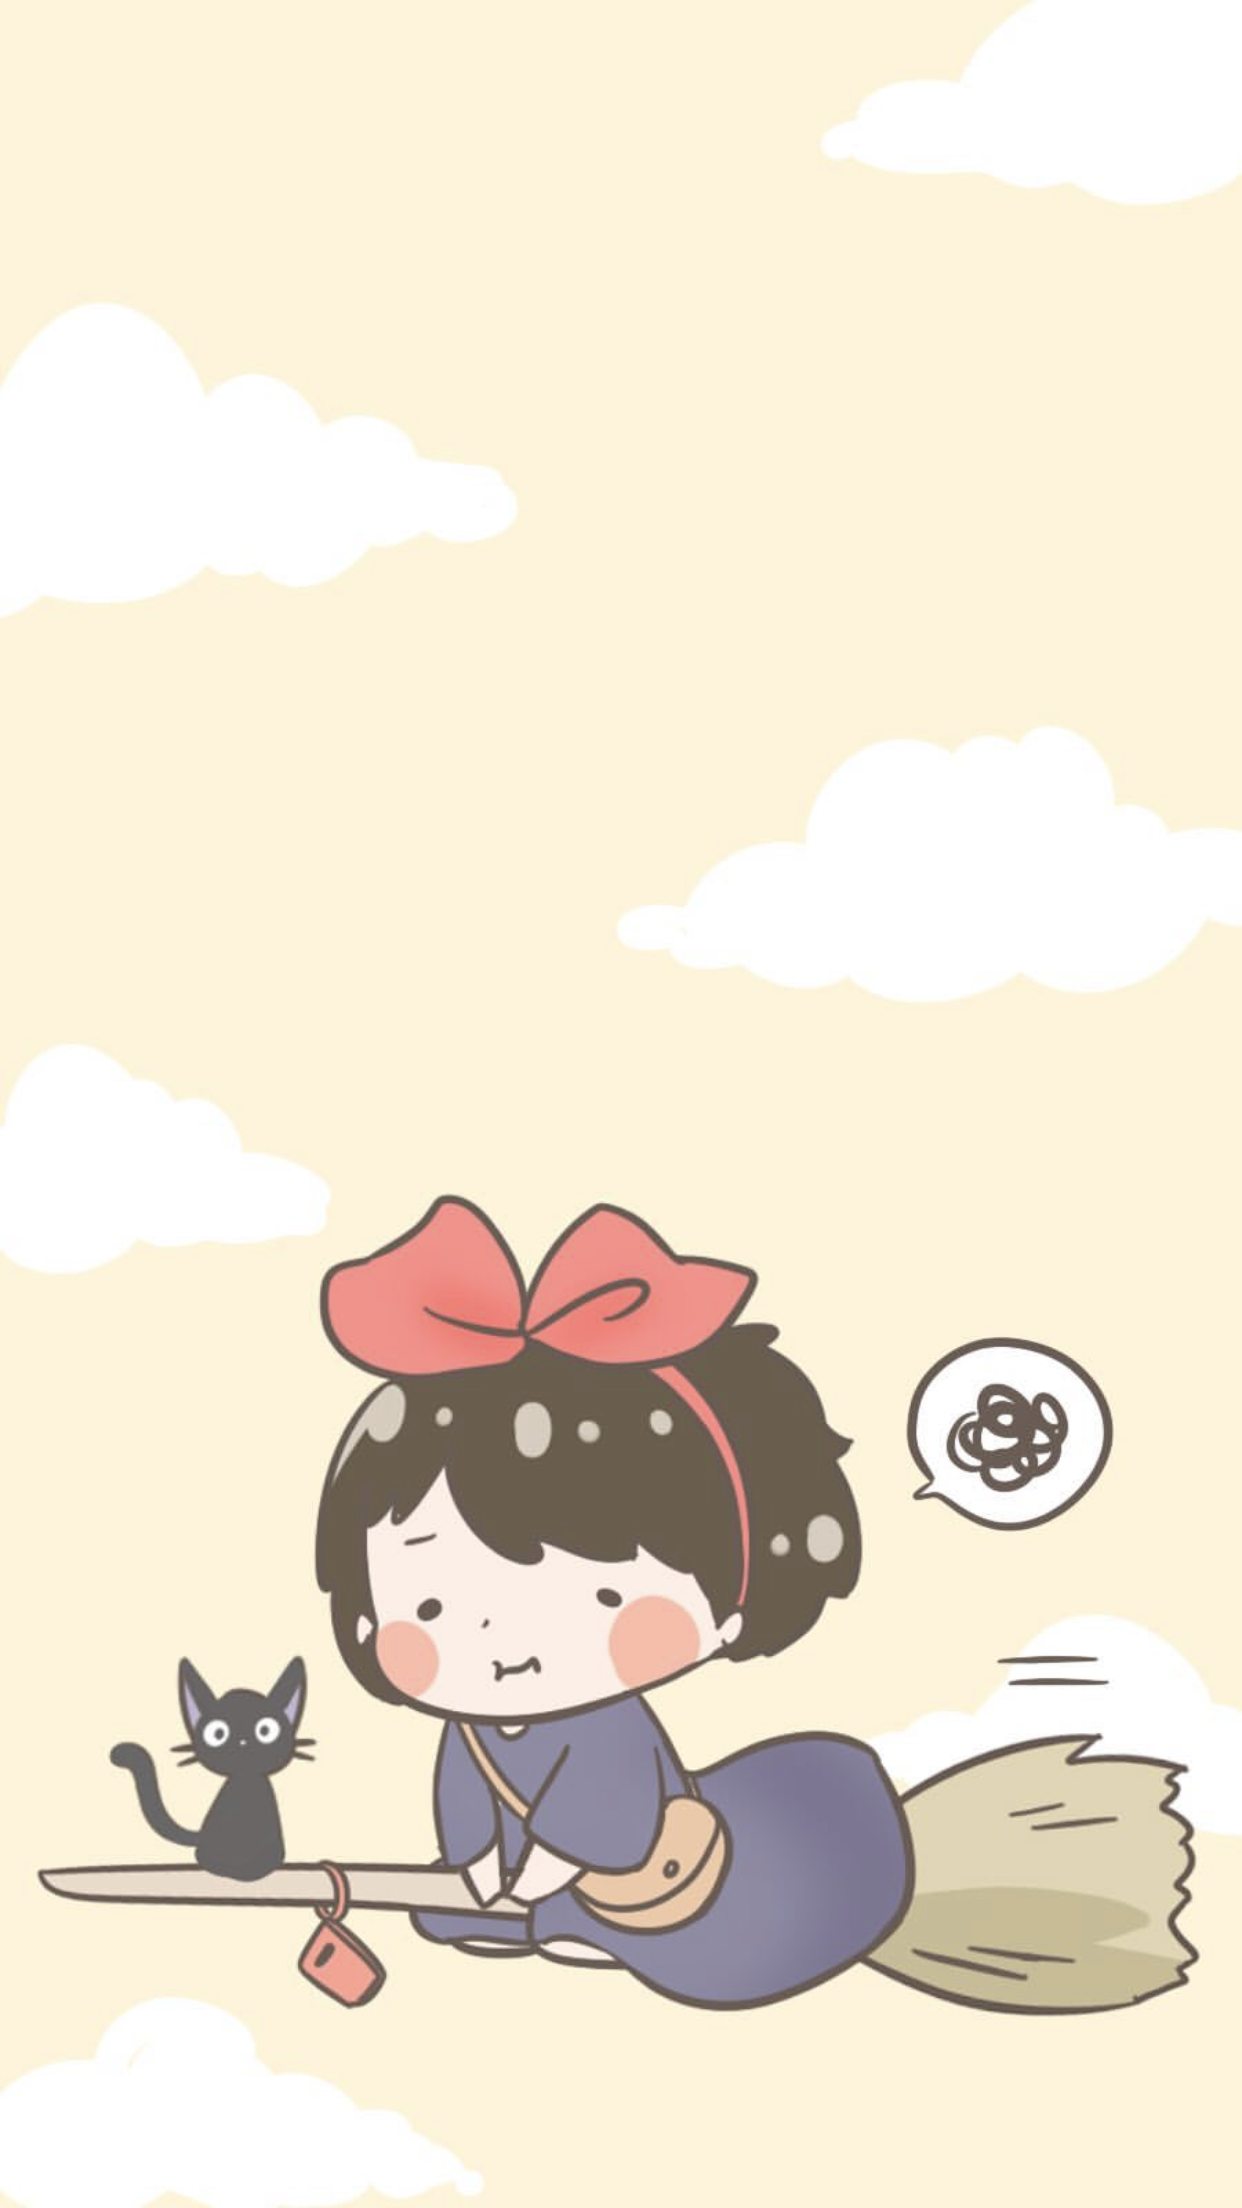 Pin By Iam Siucowcow On Wallpaper Kawaii Wallpaper Cute Cartoon Wallpapers Cute Anime Wallpaper